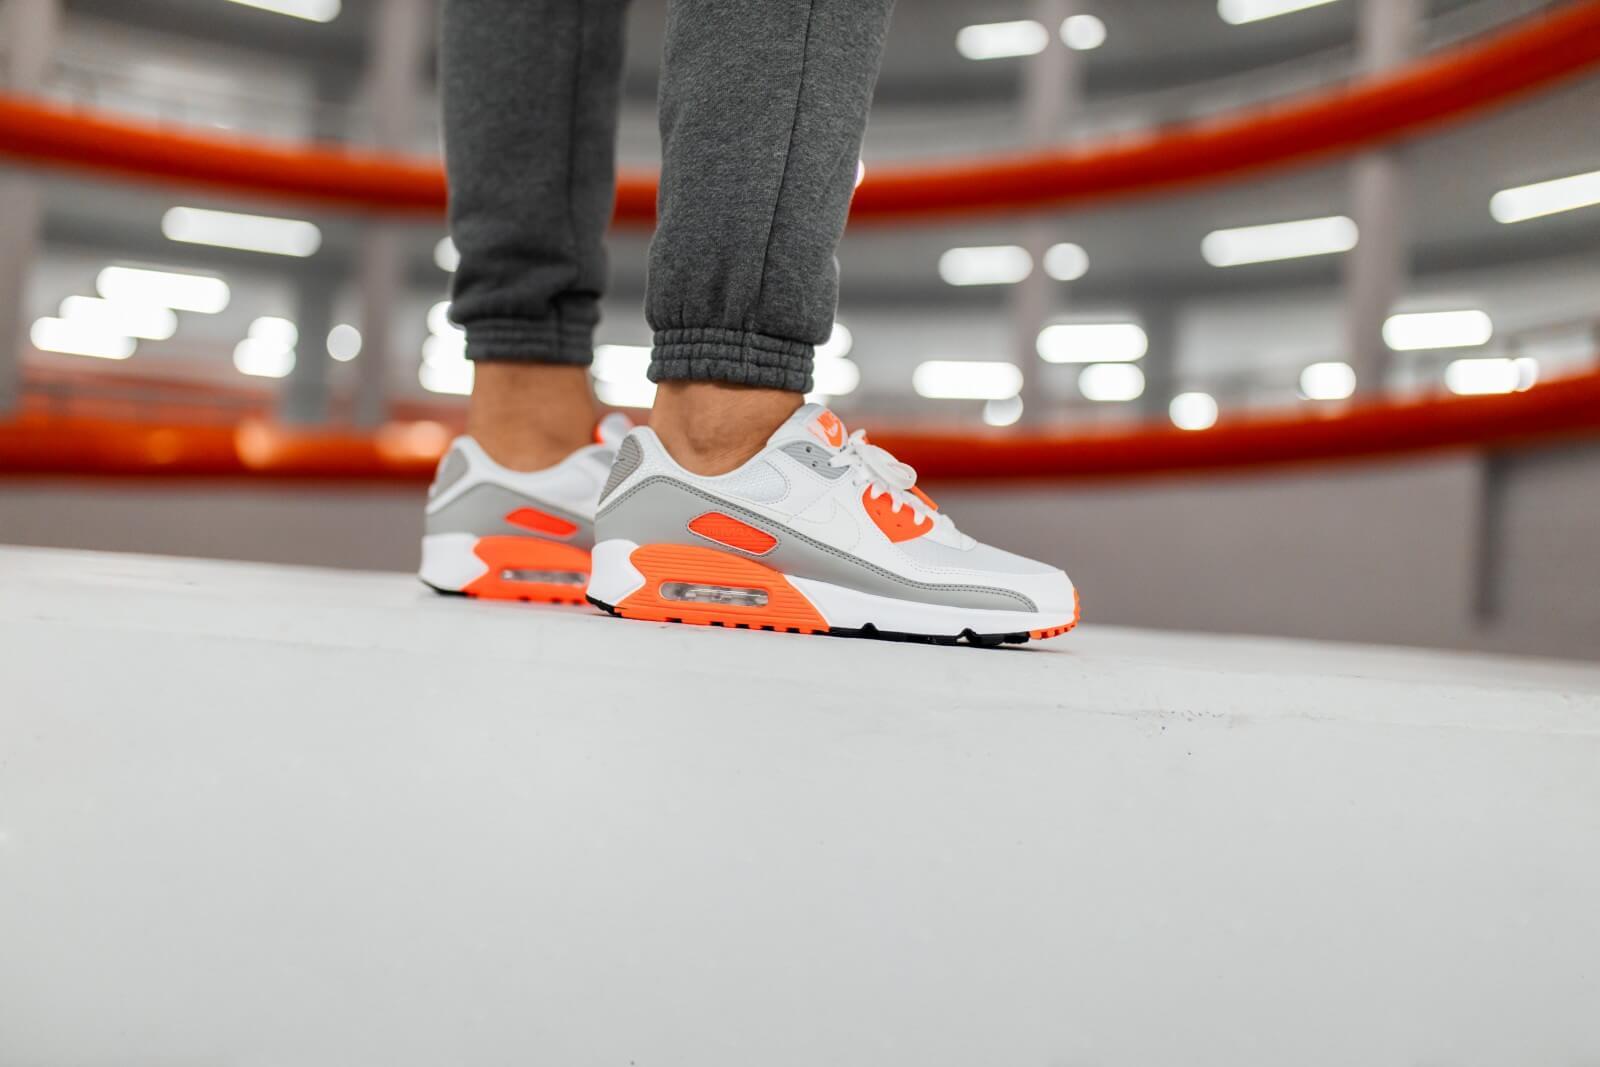 Nike Air Max 90 White/Hyper Orange-It